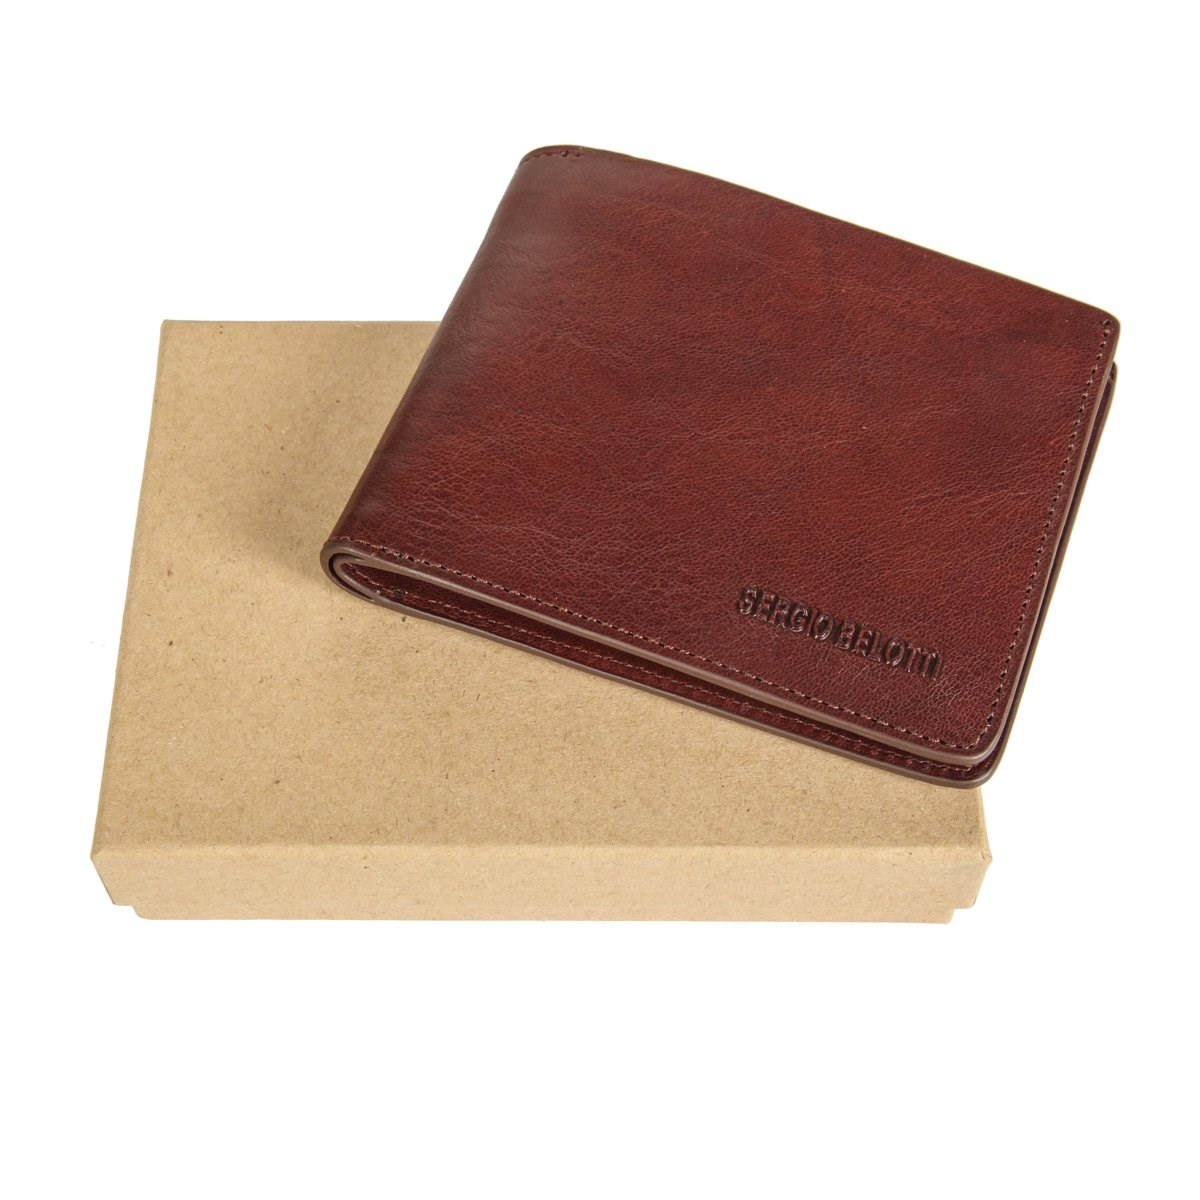 Coin Purse Sergio Belotti 3557 IRIDO Brown simple retro split leather coin purse w belt buckle brown